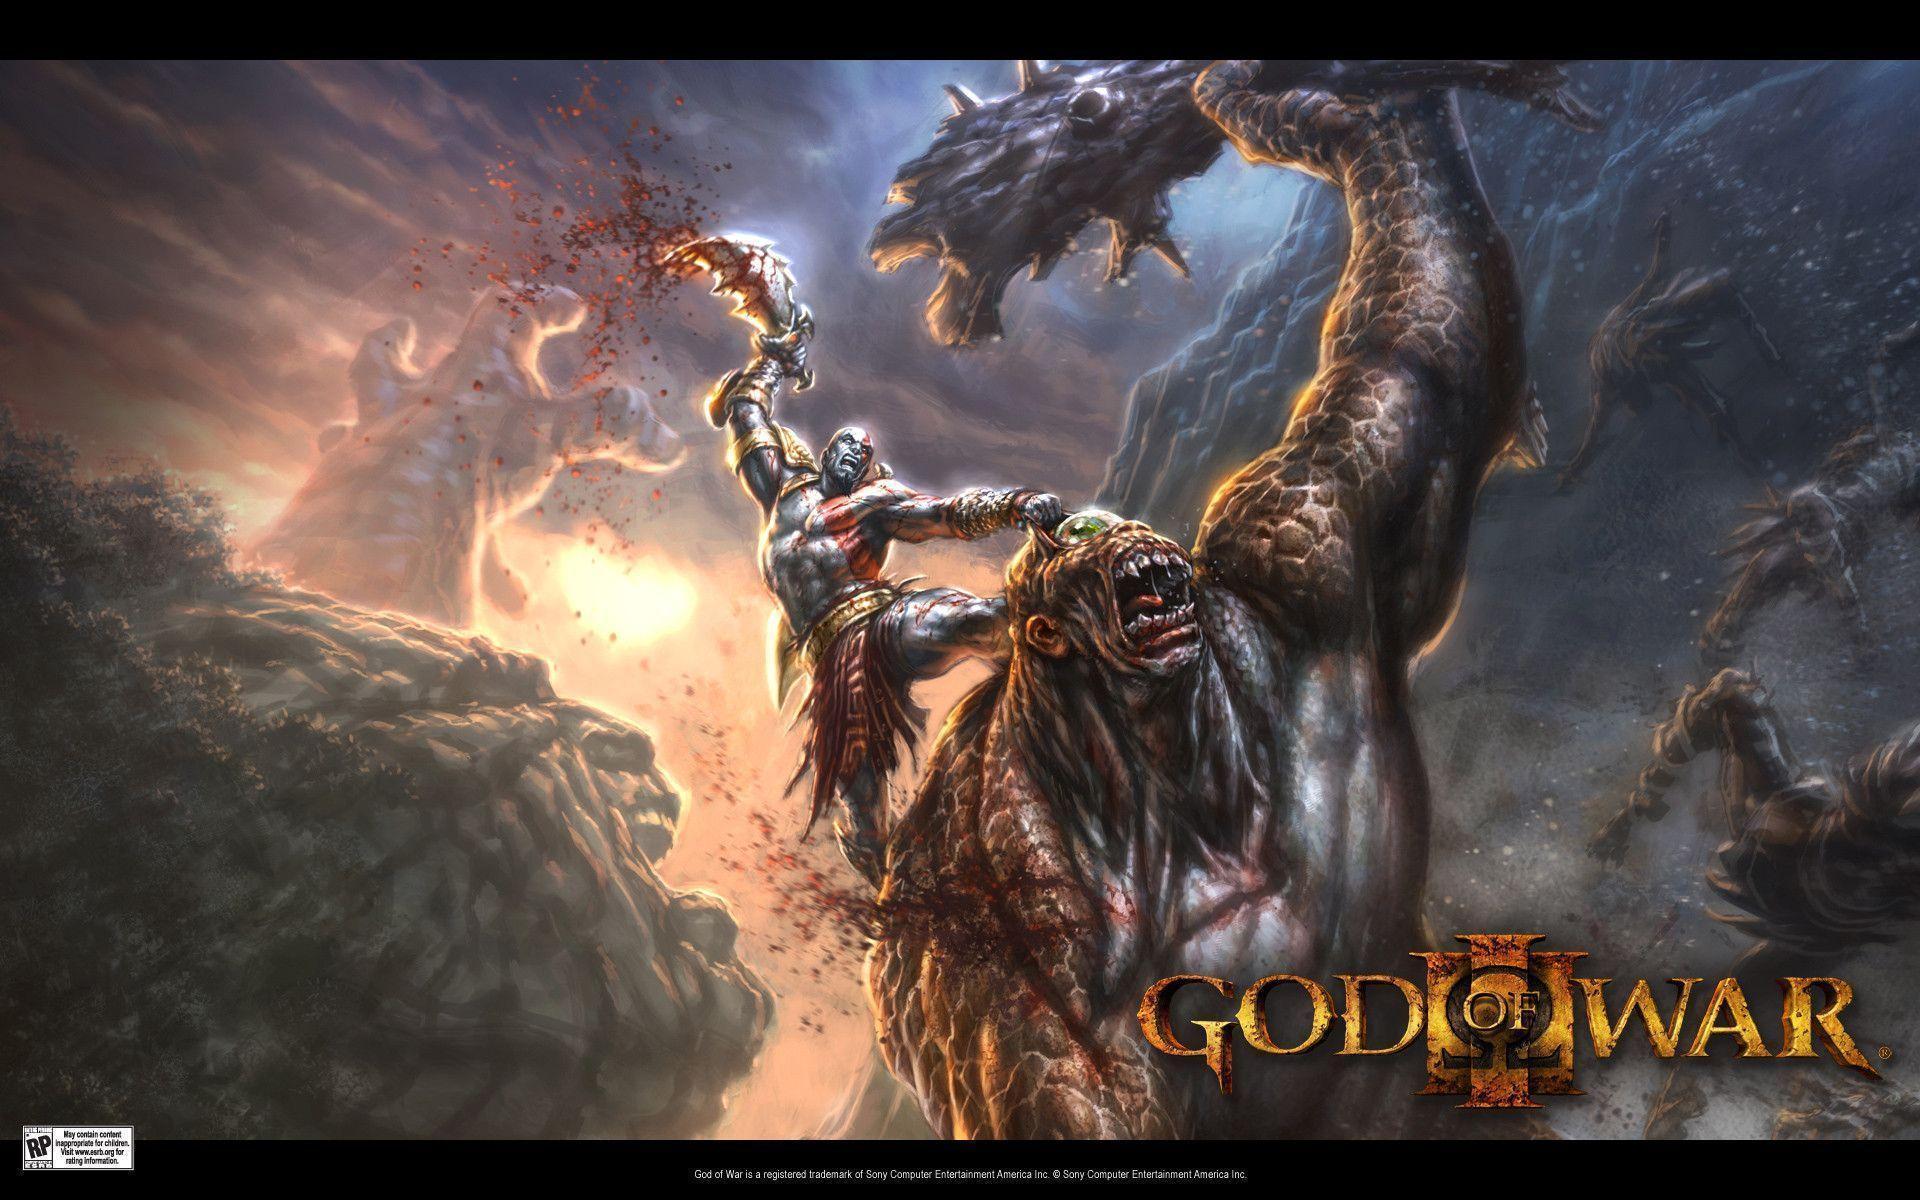 god of war 1 wallpaper hd - photo #4